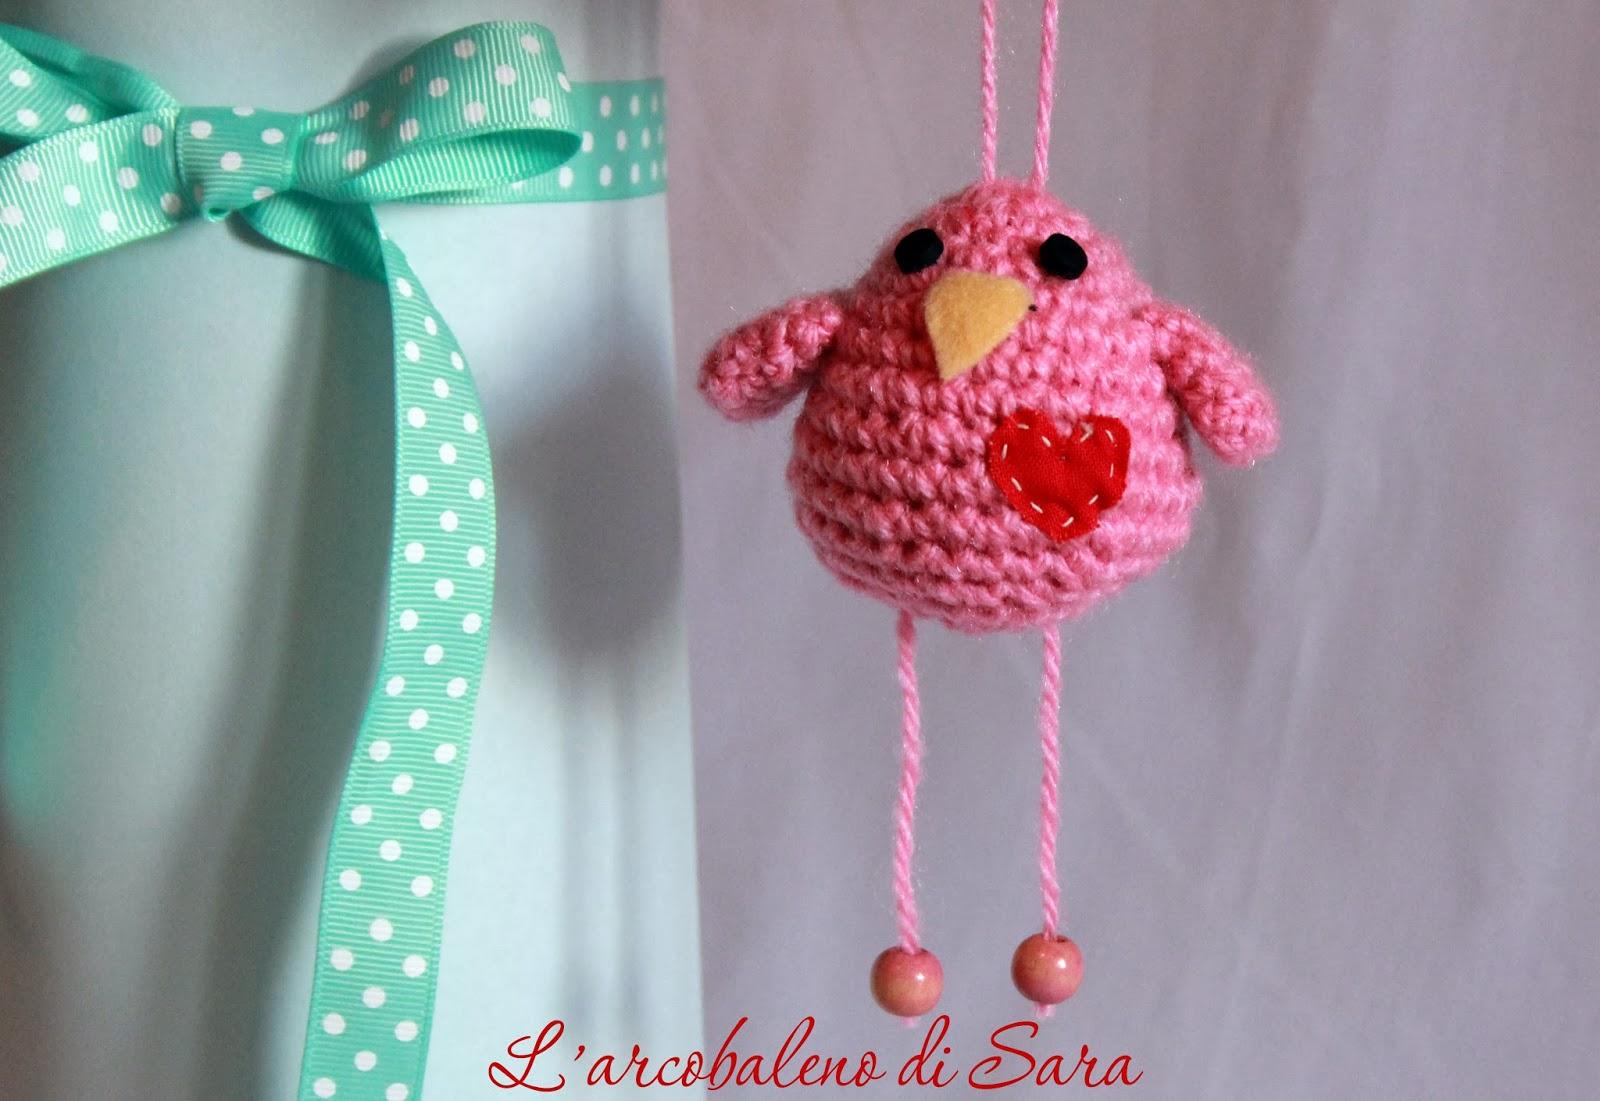 Crochet Bird Tutorial Larcobaleno Di Sara